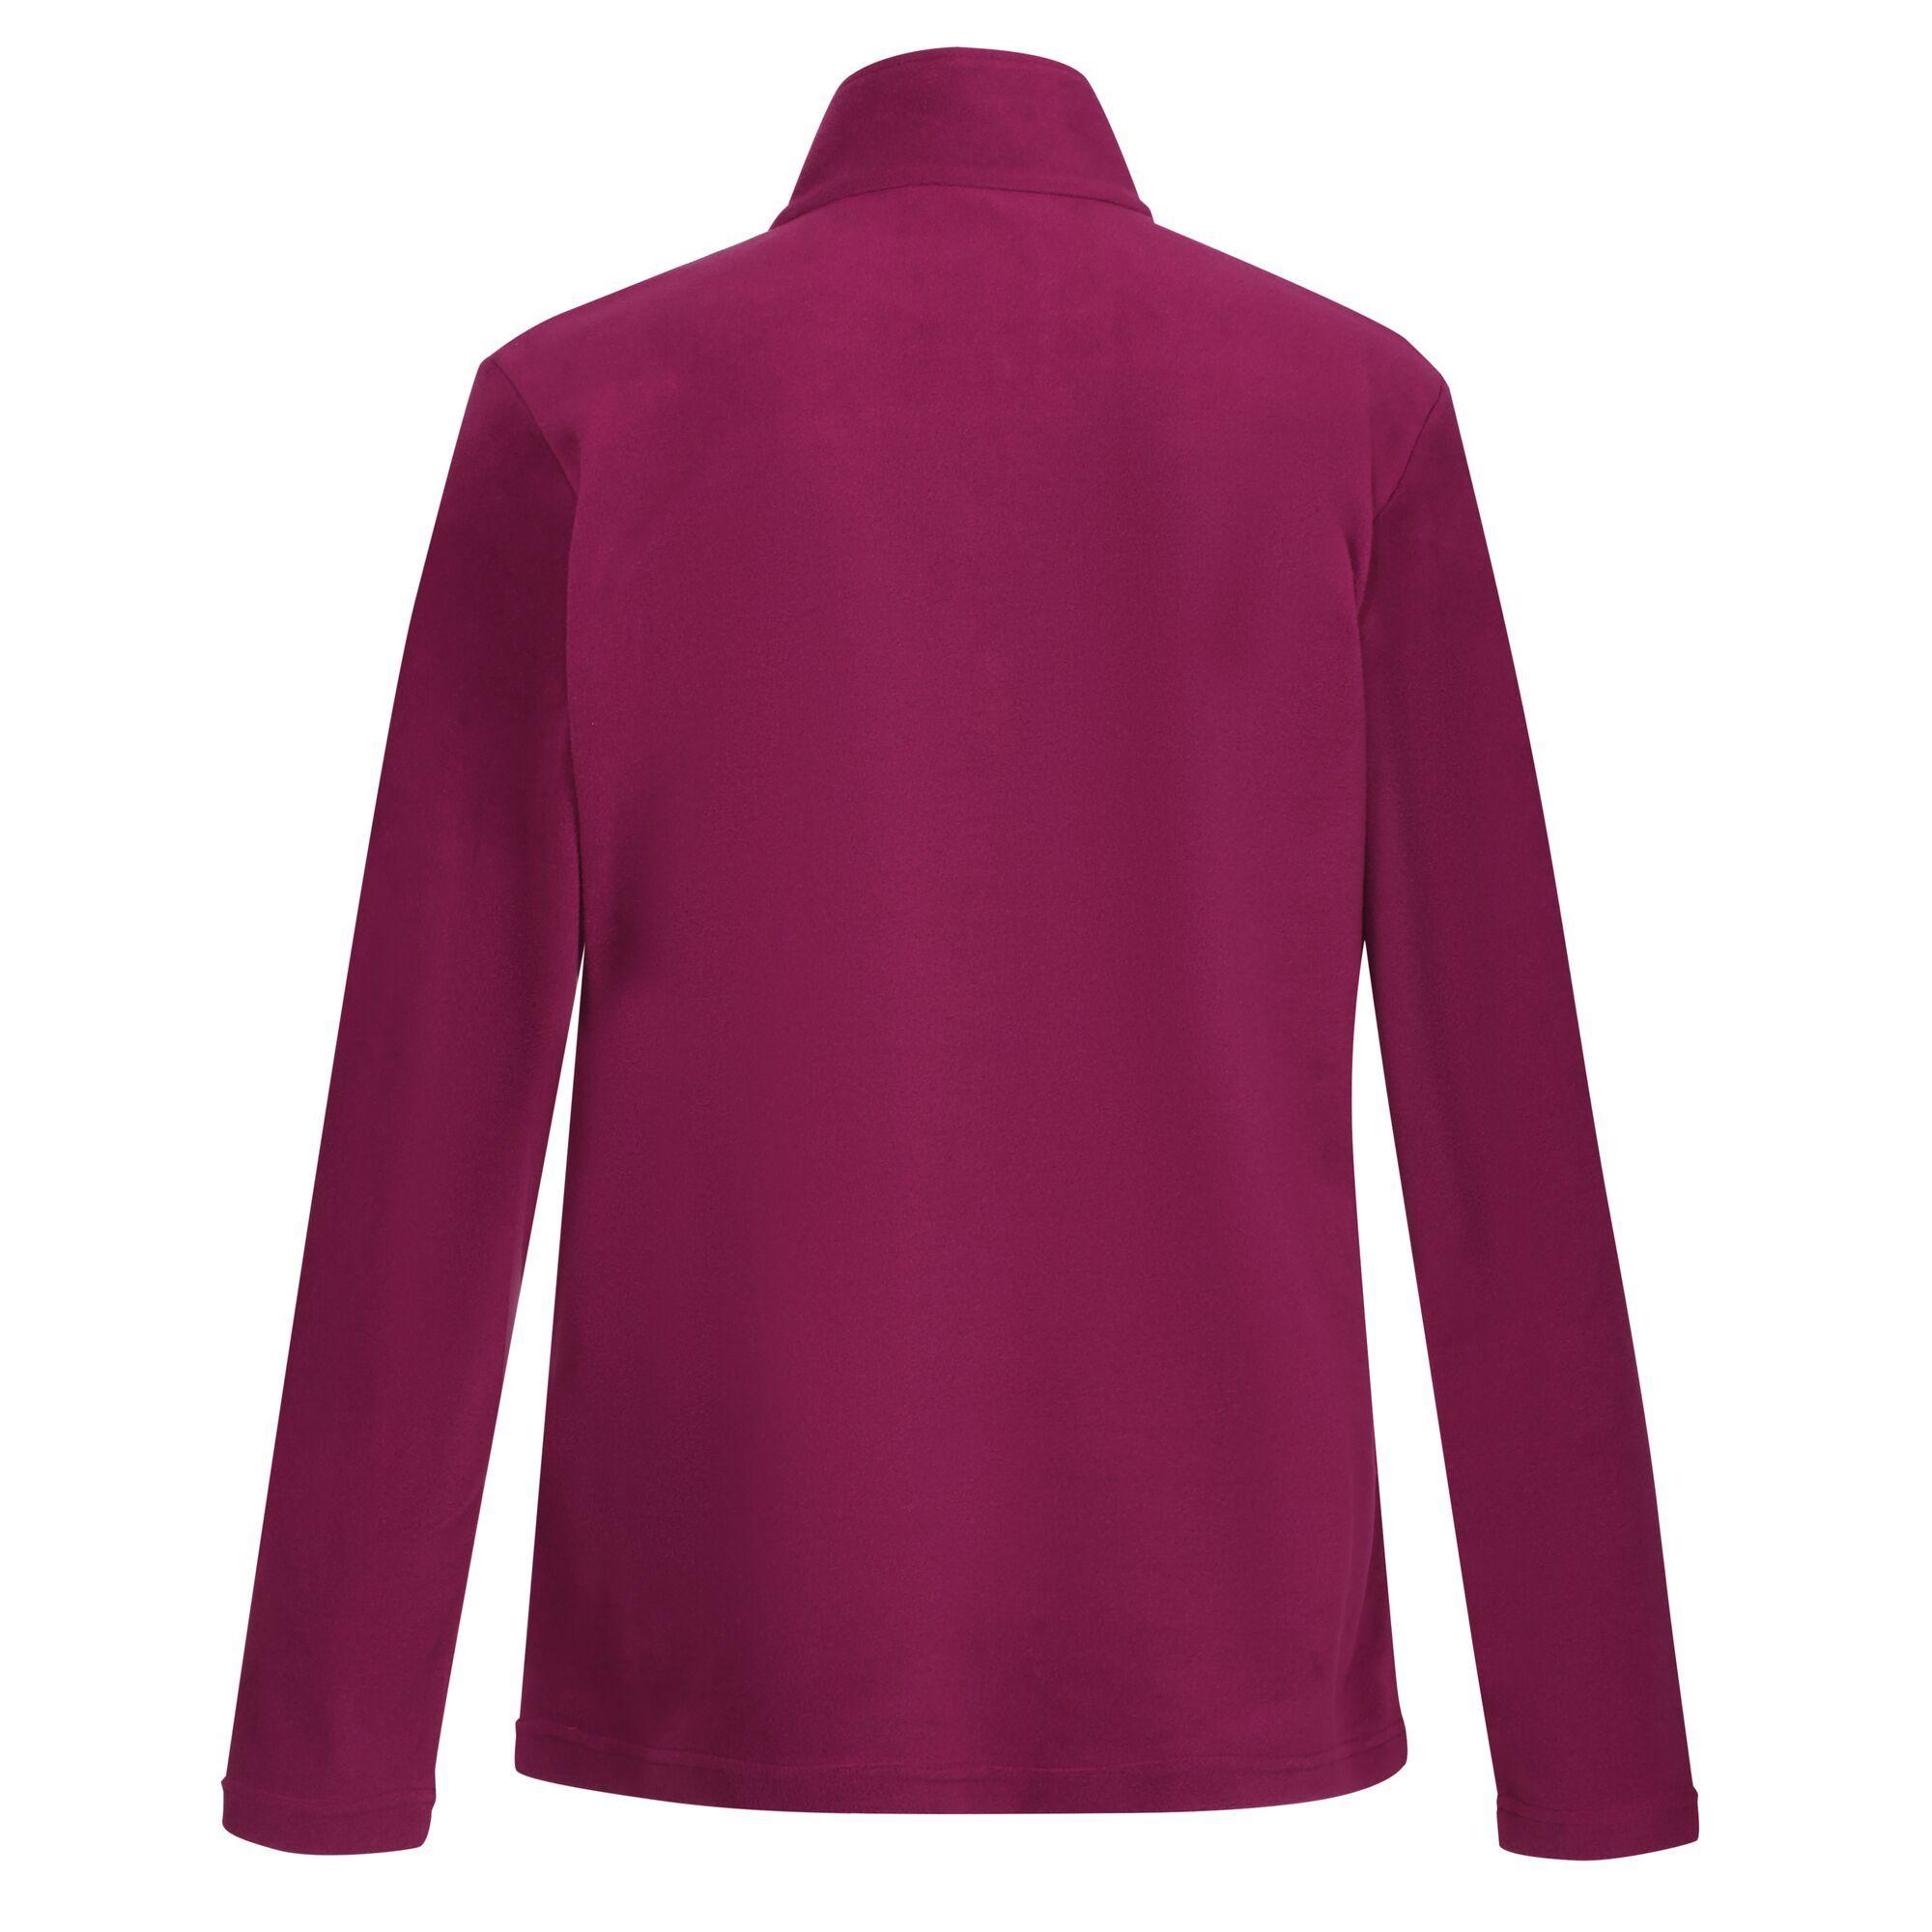 New Regatta Women's Sweetheart Fleece Top